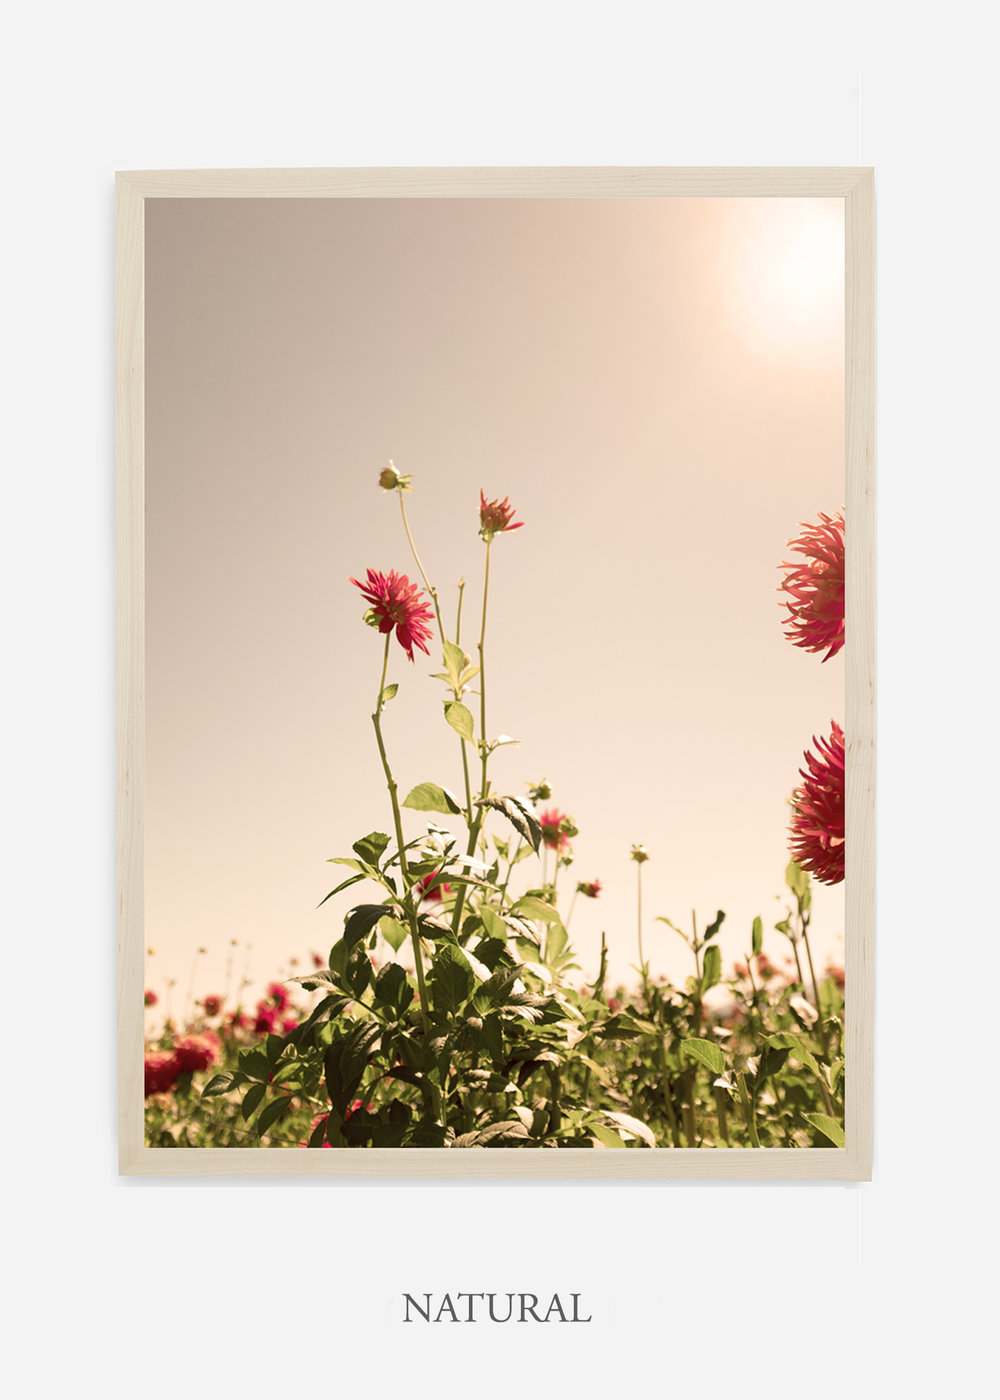 DahliaNo.2_naturalframe__NoMat_interiordesign_botanicalprint_art.jpg